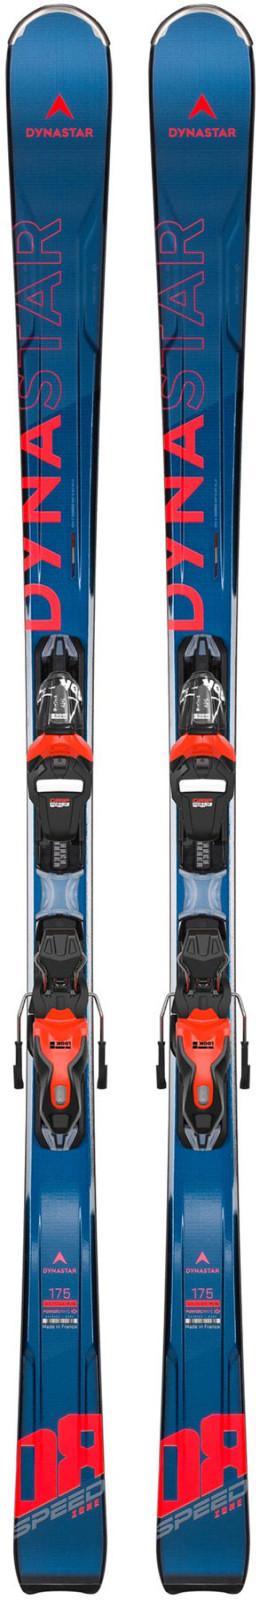 Dynastar Speed Zone 8 Ca Xpress2 + Xpress 11 GW